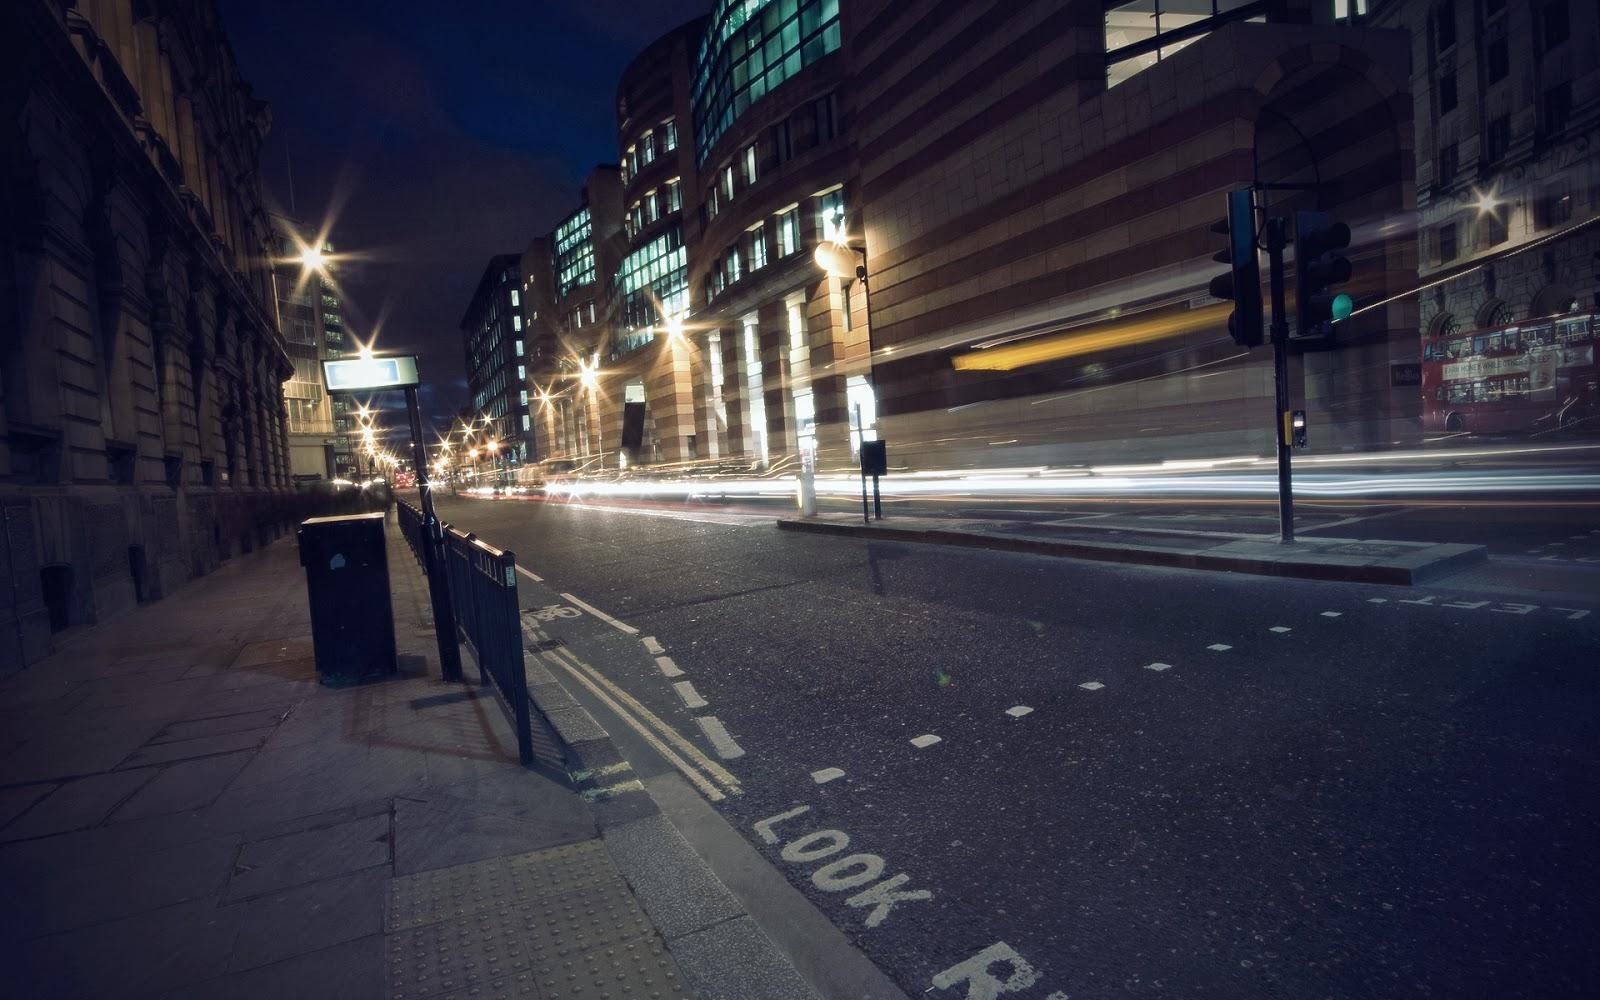 Hd Wallpapers Blog Night Street Hd Wallpapers 1600x1000